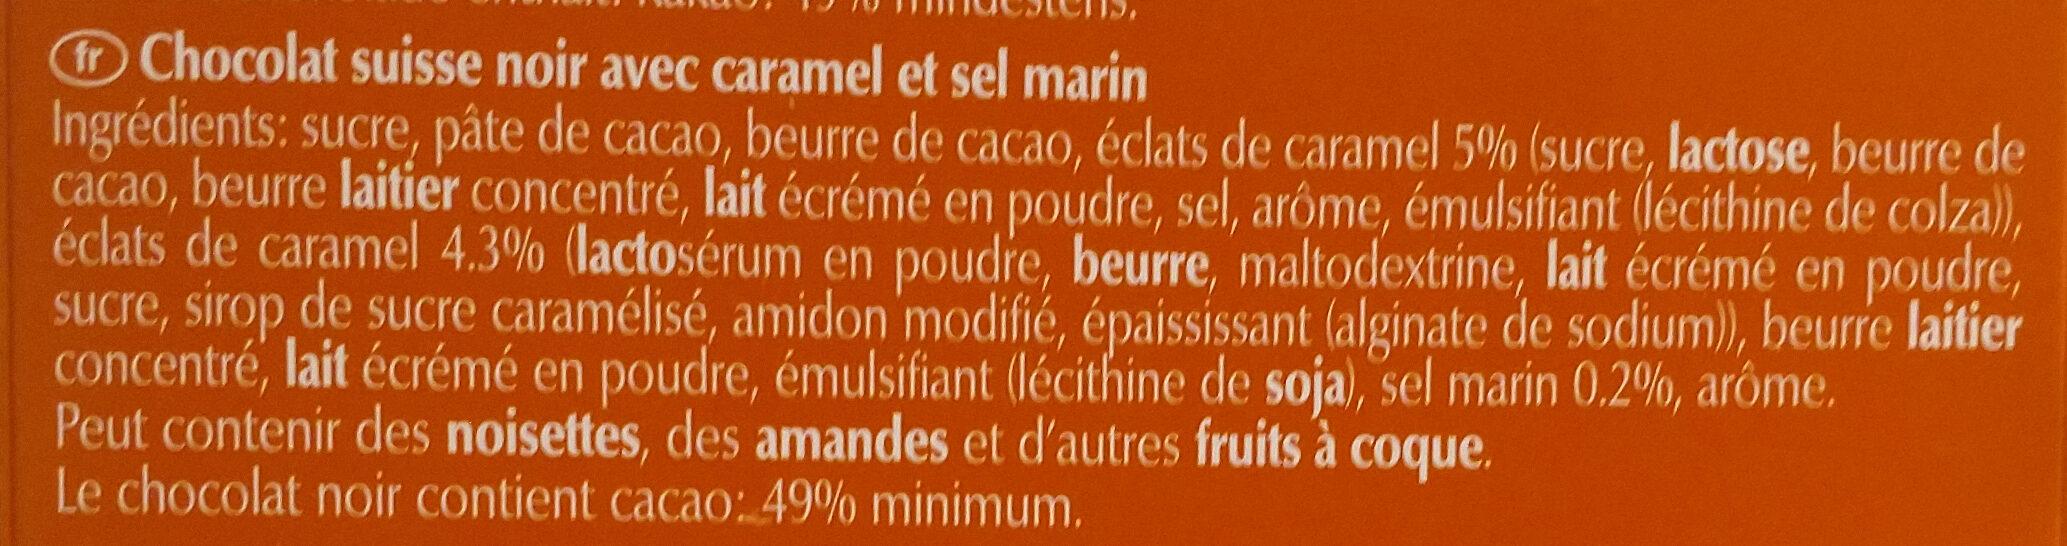 Grand Plaisir Caramel & Fleur De Sel Noir - Ingredients - fr